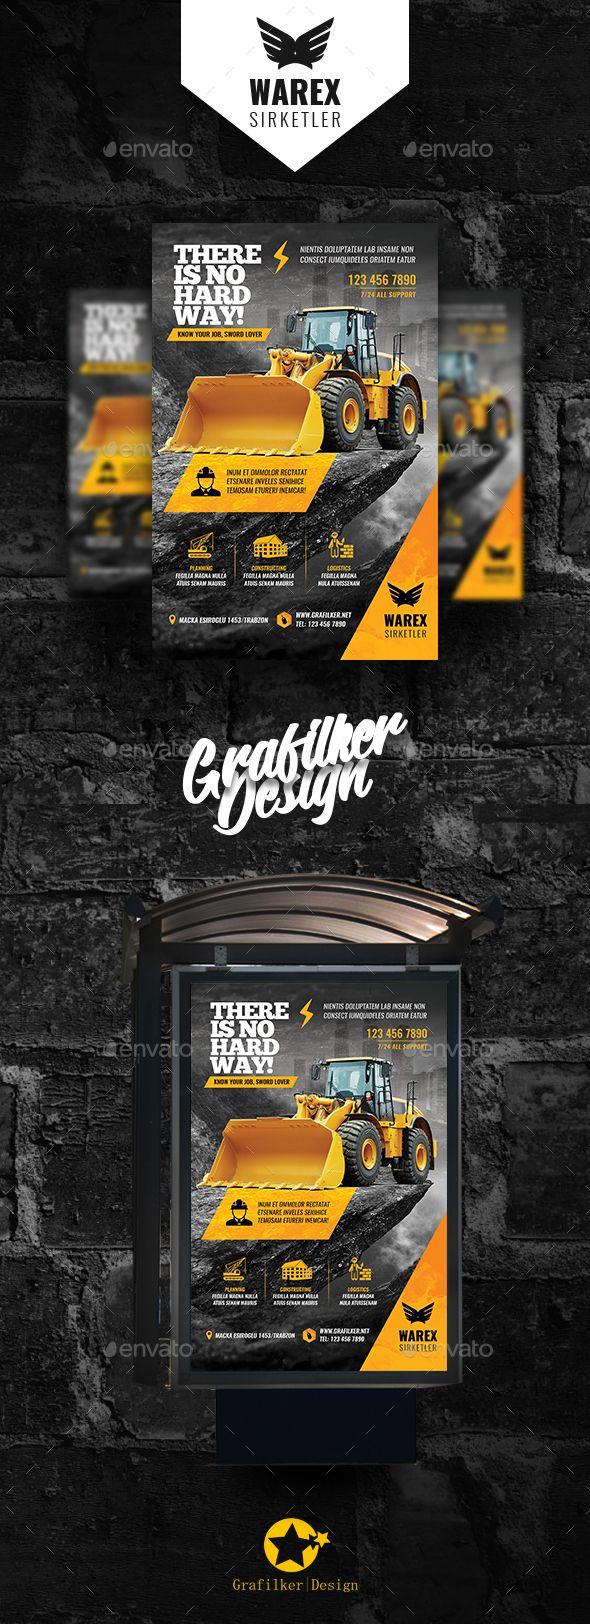 #Construction Poster Templates - #Signage Print Templates